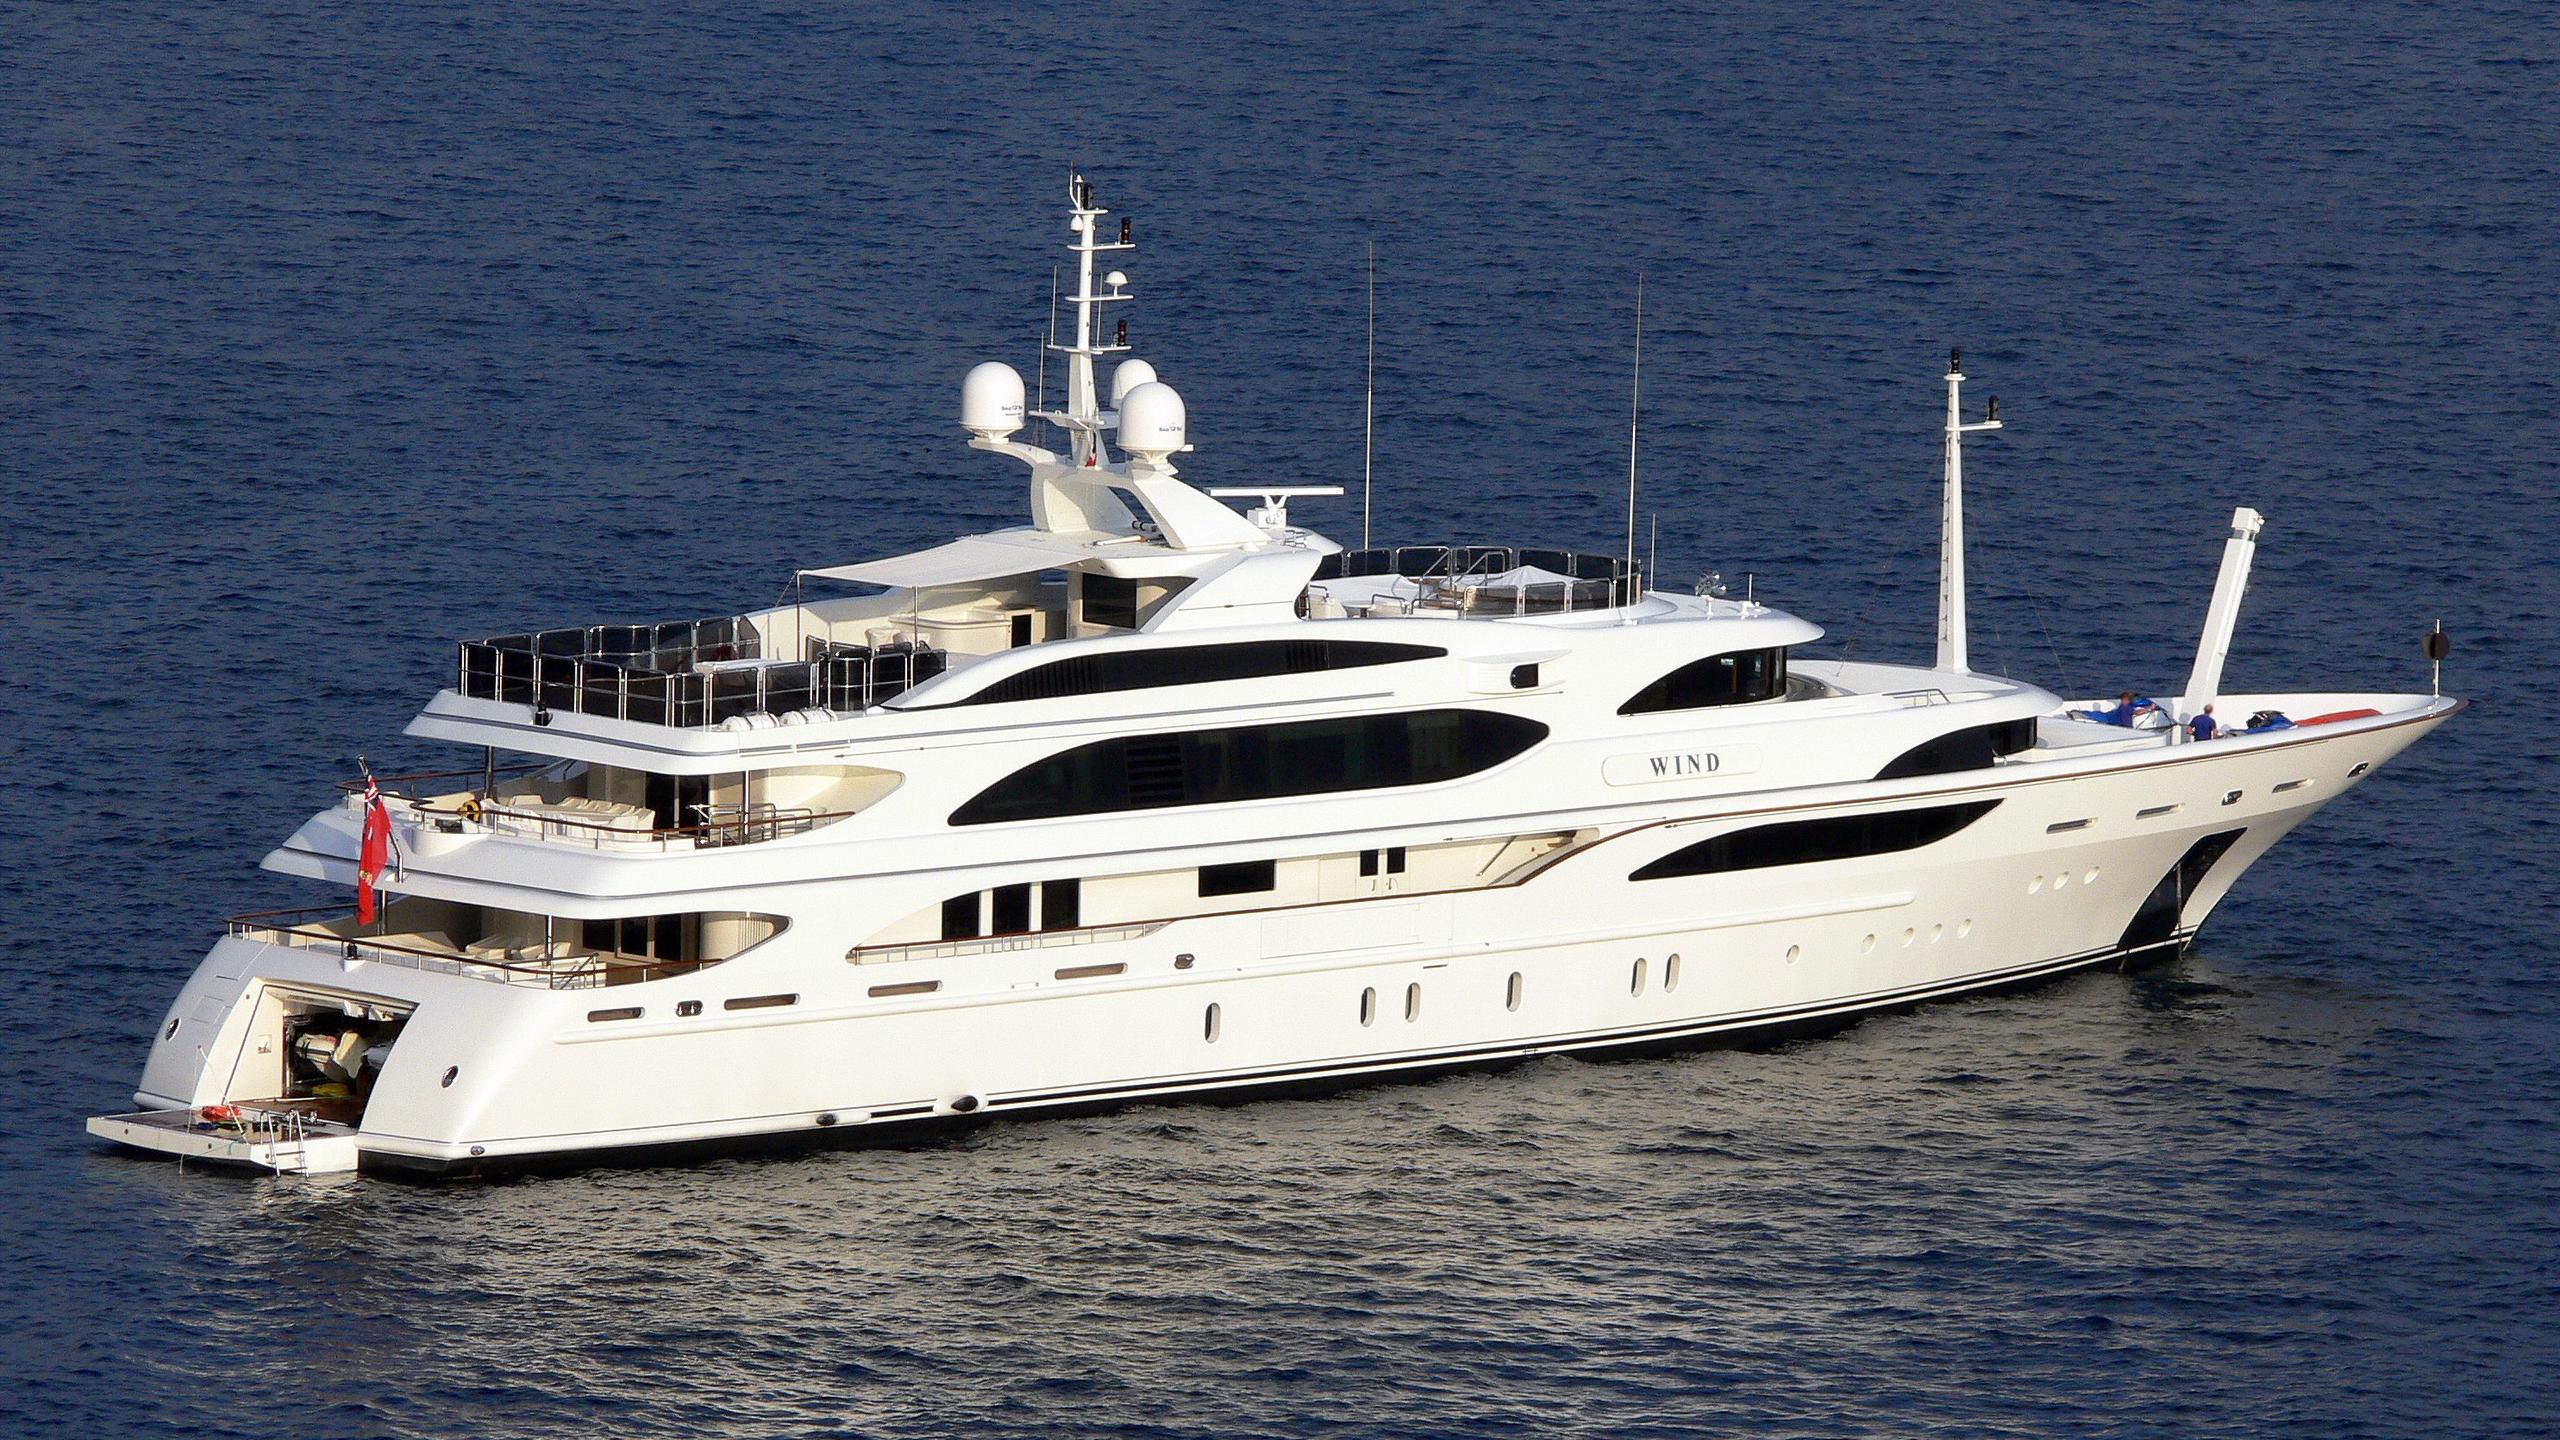 galkynys-motor-yacht-benetti-2007-59m-profile